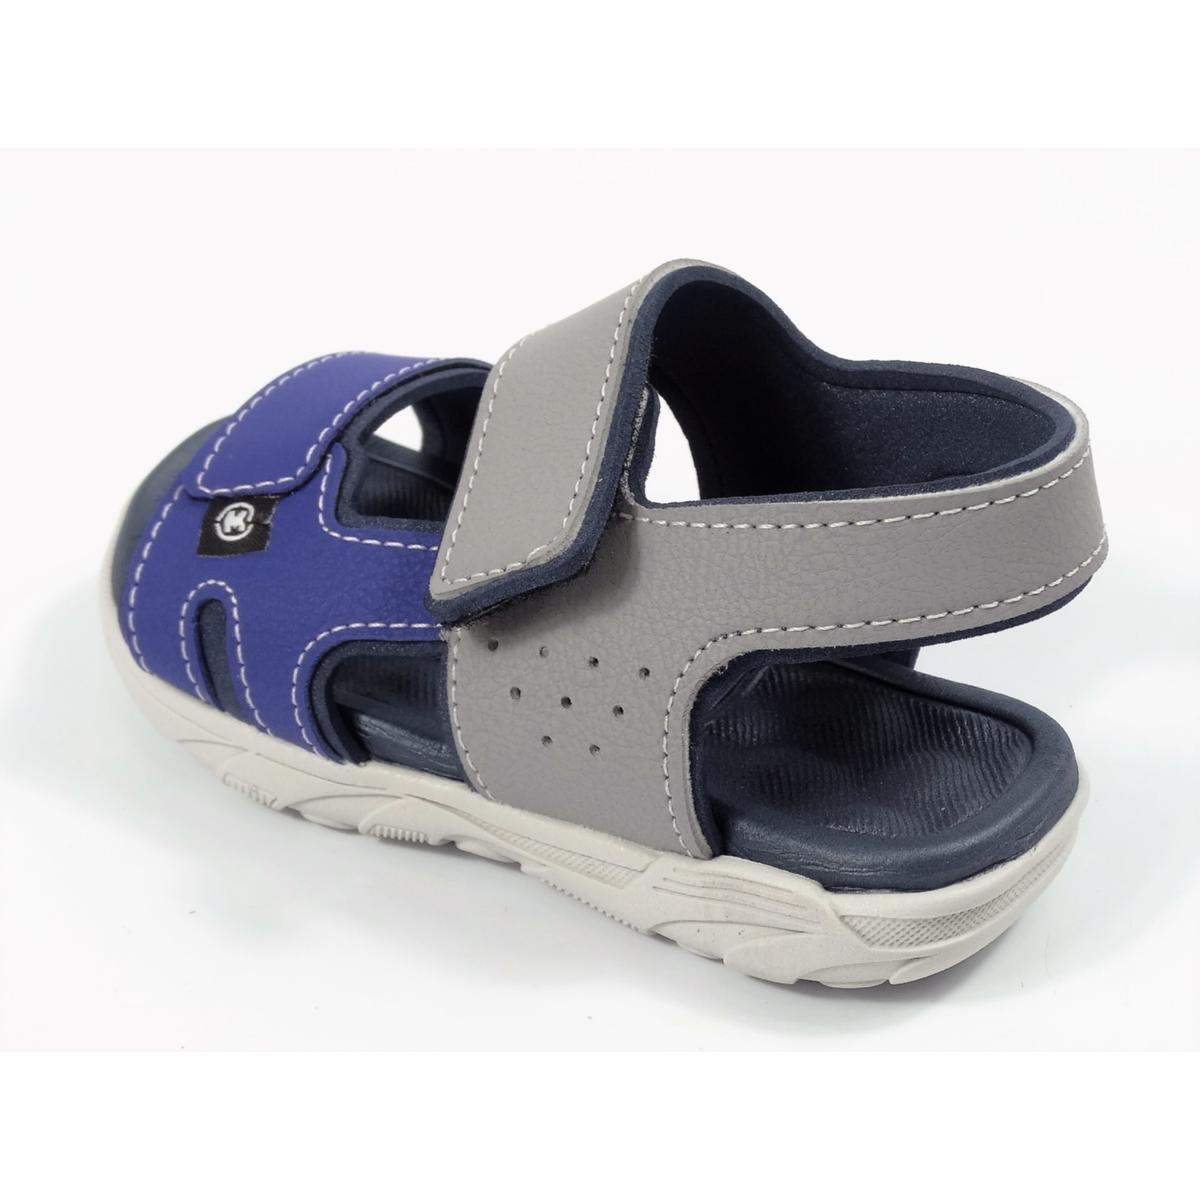 Sandalia Infantil Masculina Molekinho 2135.137 - Cinza/Azul